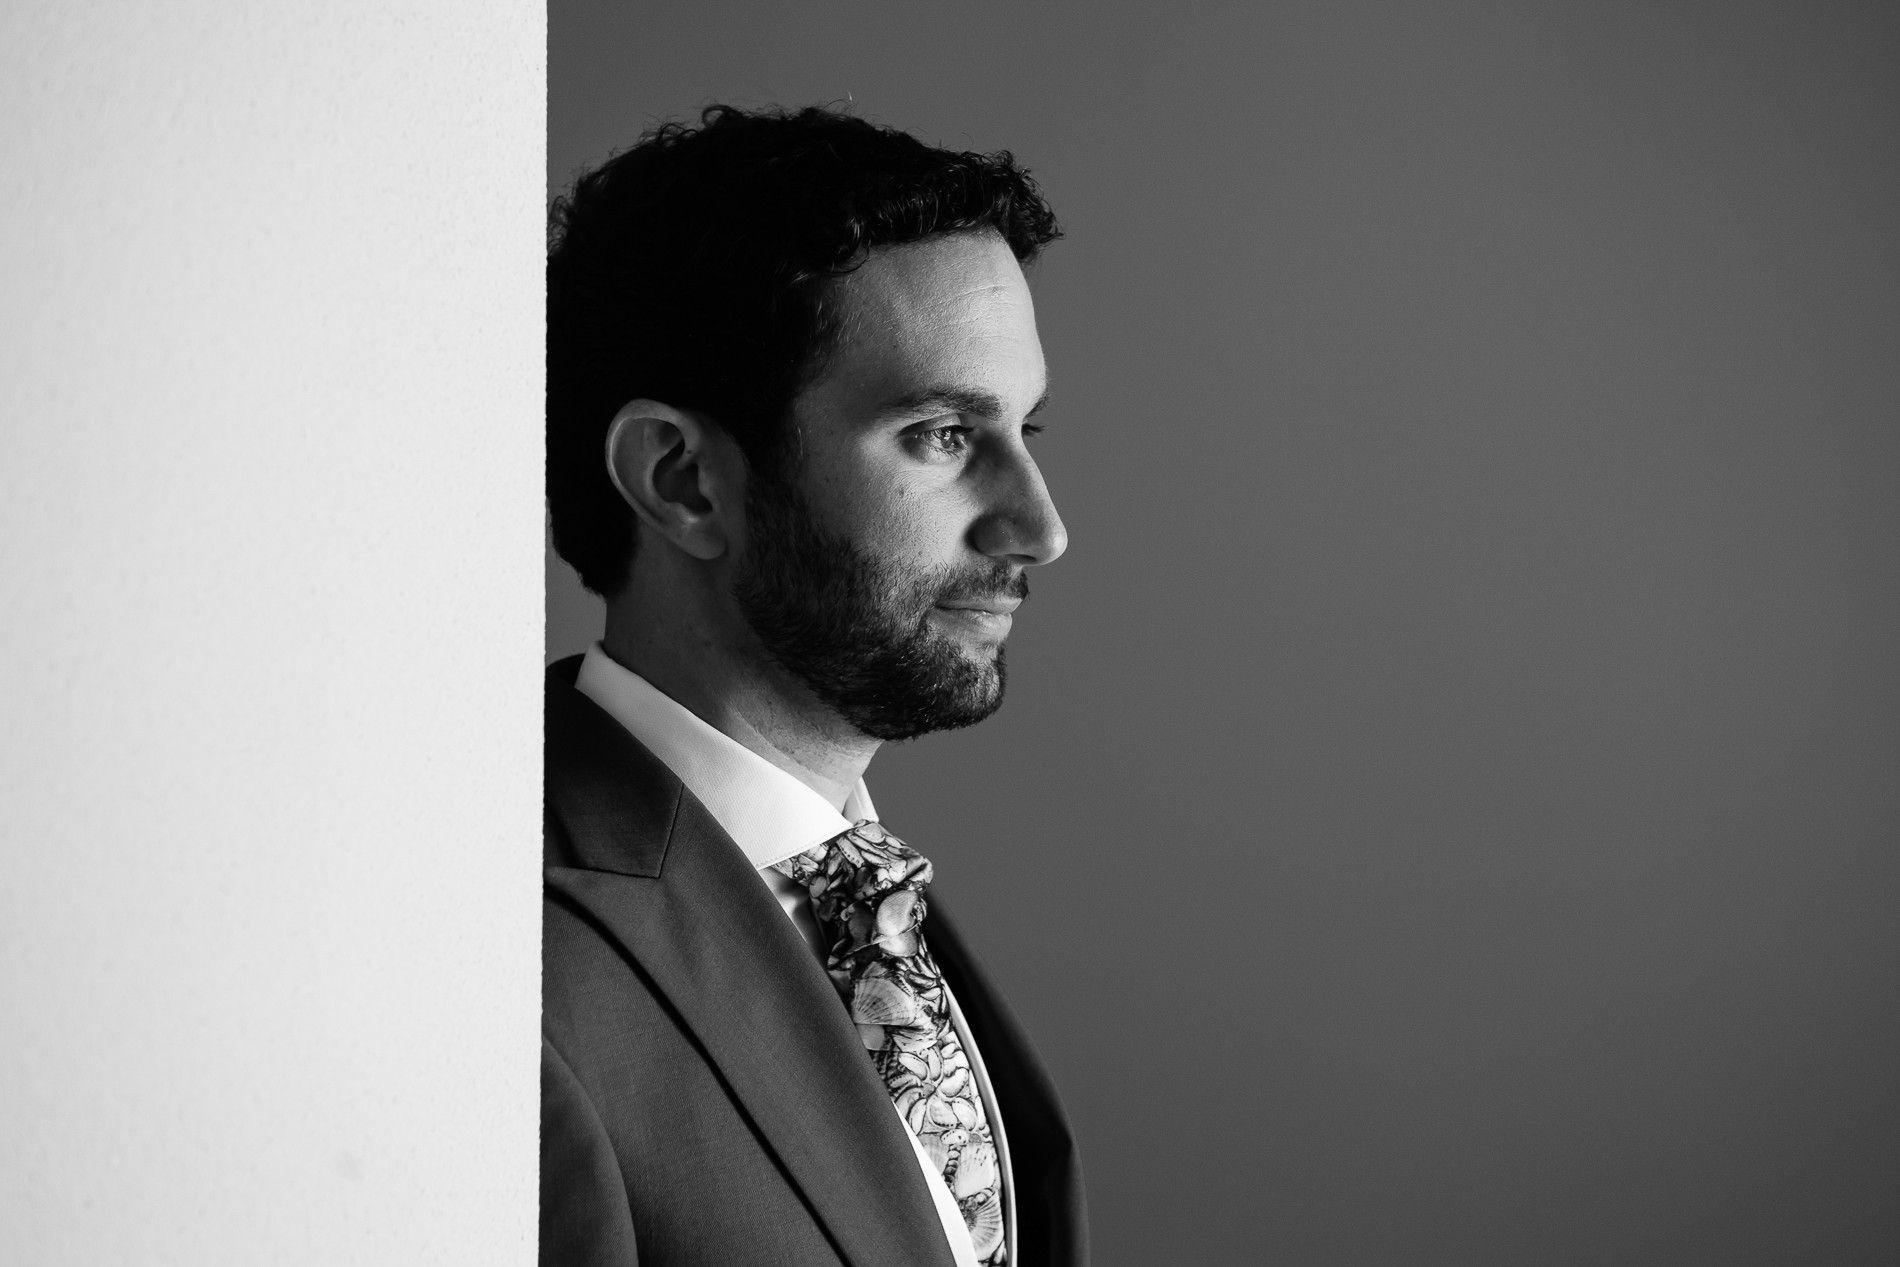 fotografo-de-boda-plasencia-09